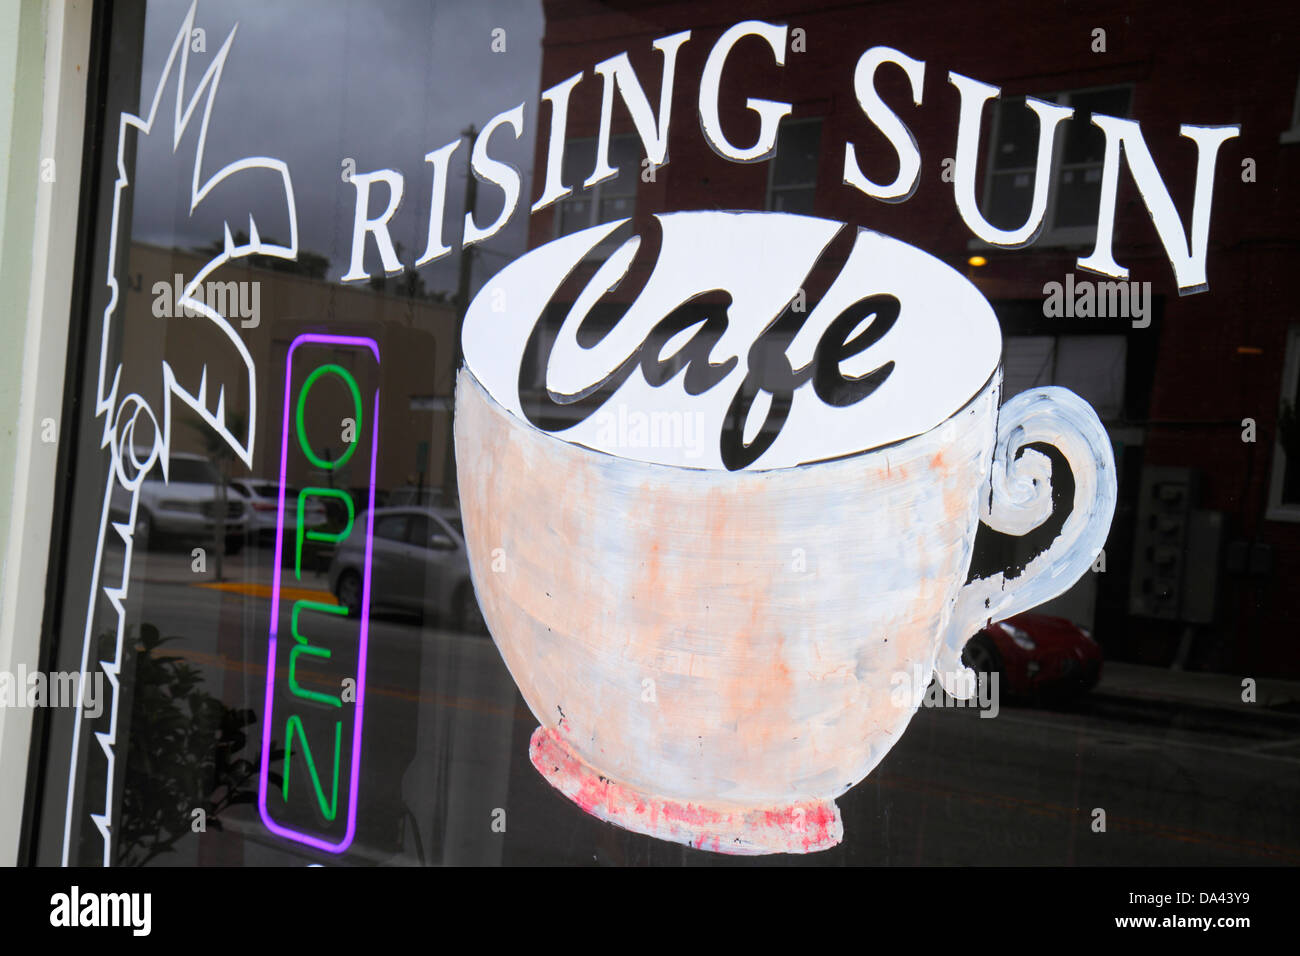 Brooksville Florida Rising Sun Cafe restaurant sign entrance - Stock Image